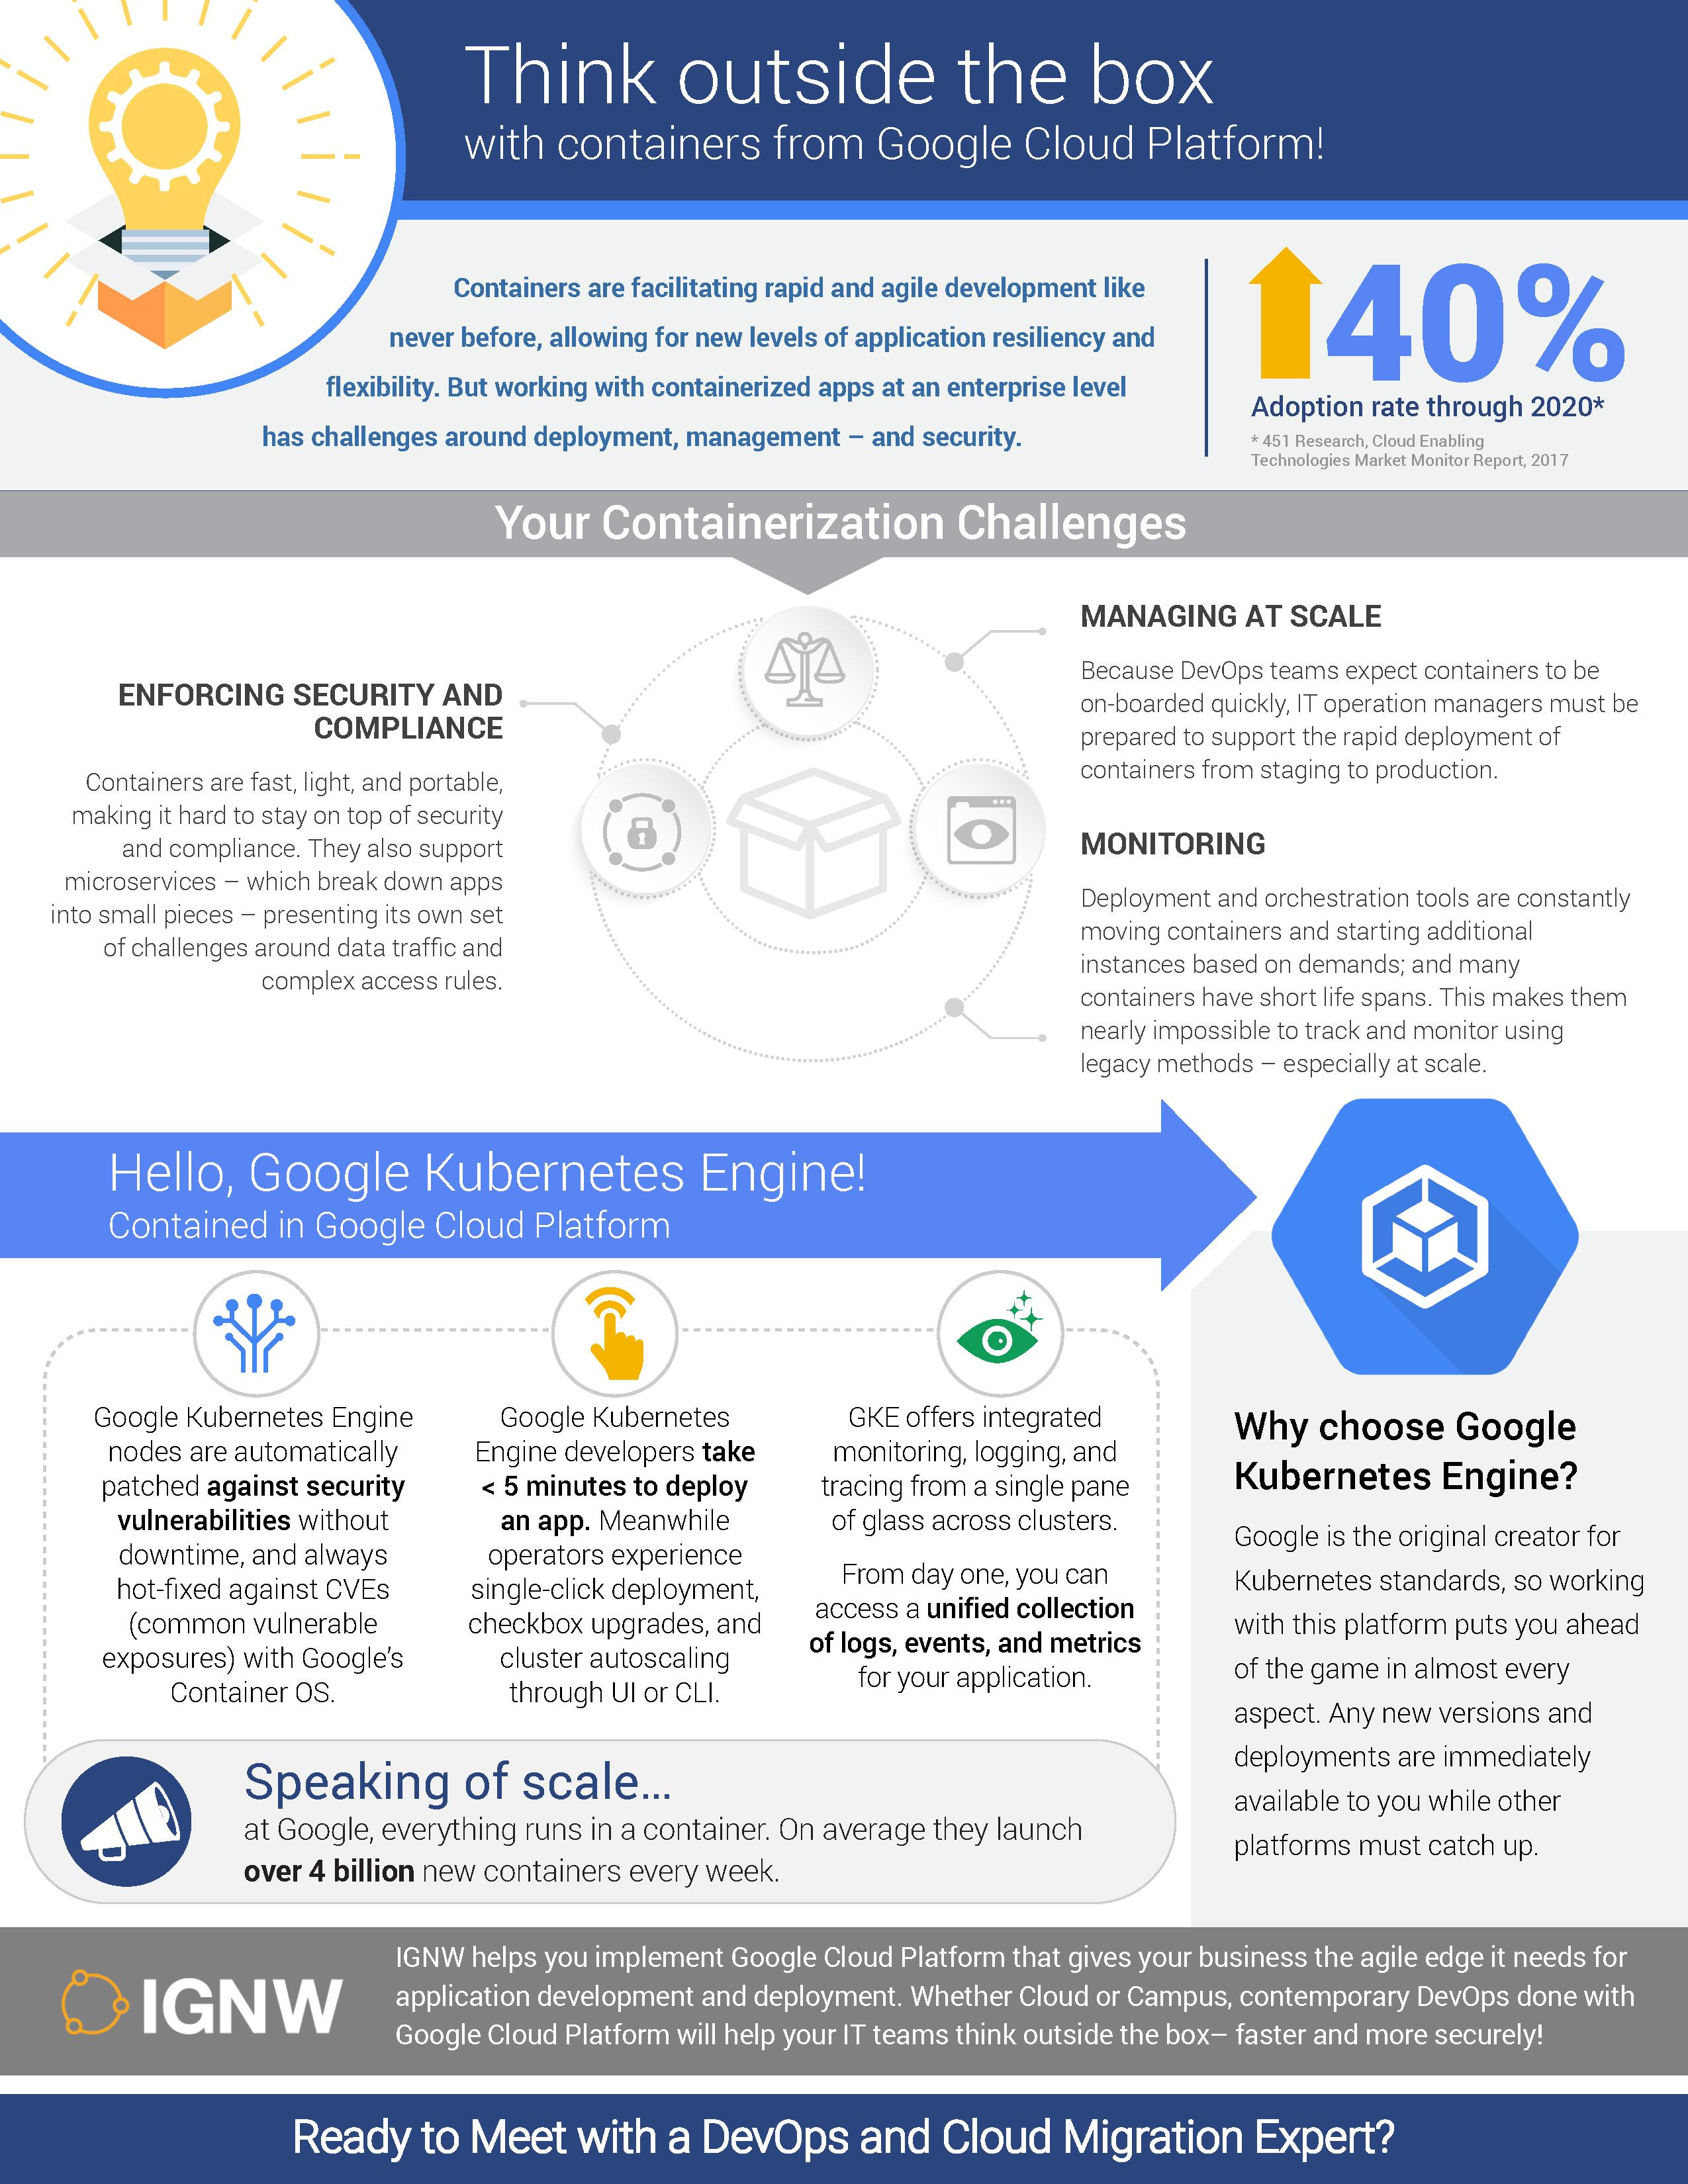 Google Cloud — IGNW